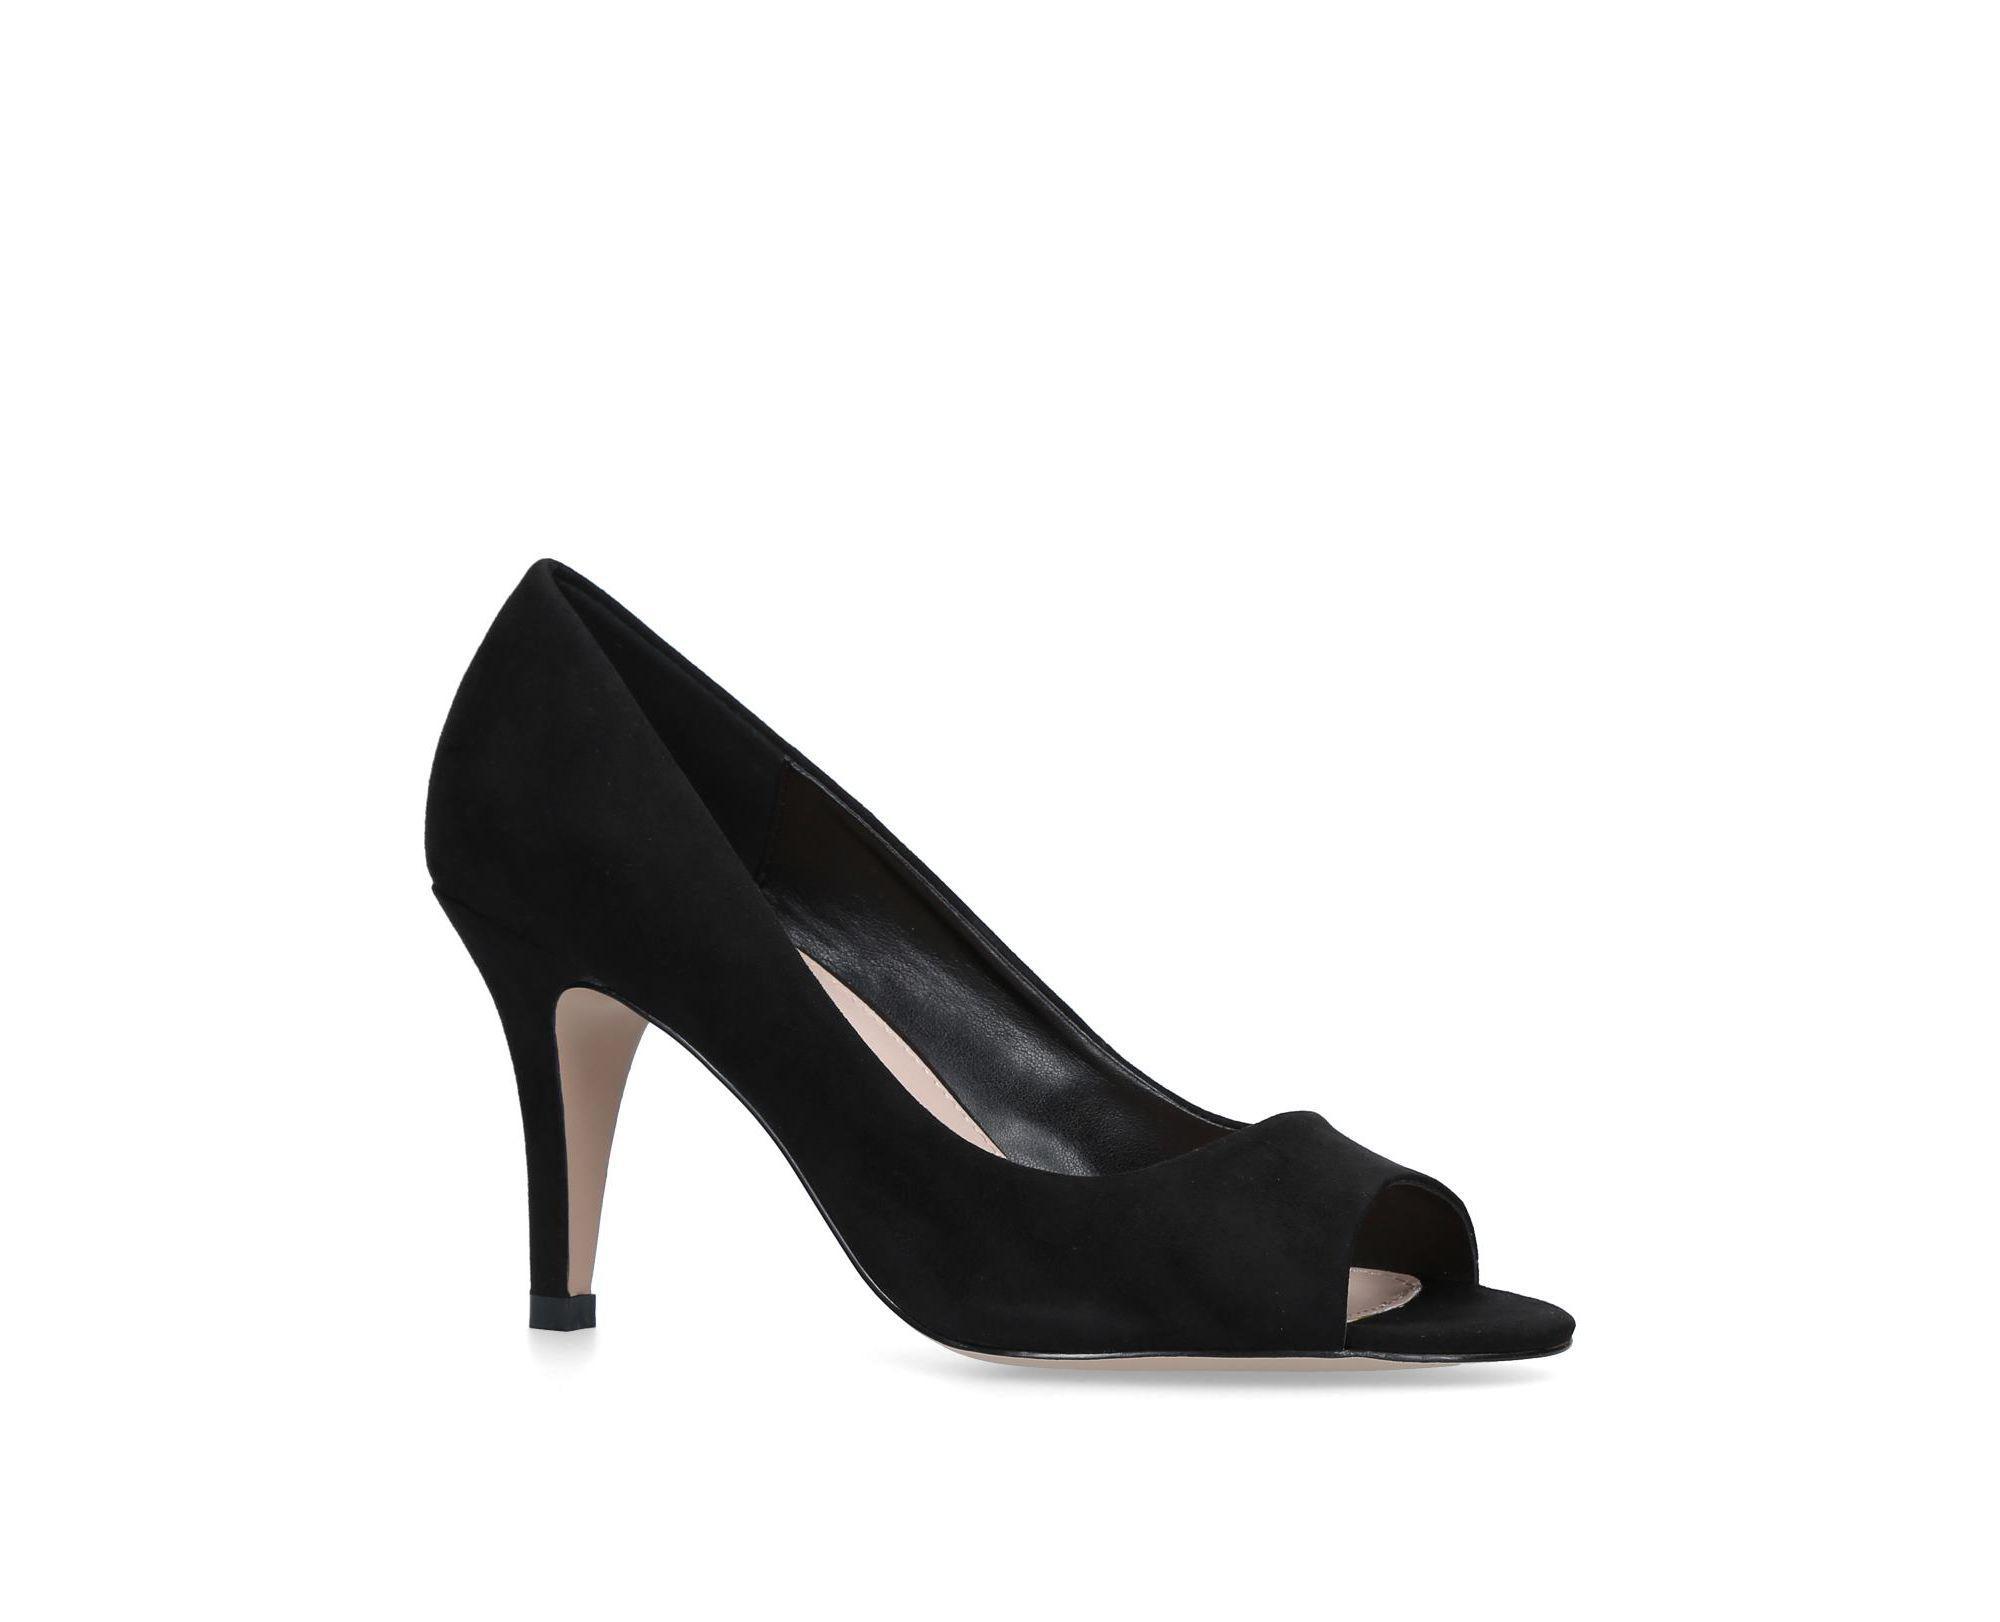 26307f14b98 Carvela Kurt Geiger  libby  Mid Heel Sandals in Black - Lyst